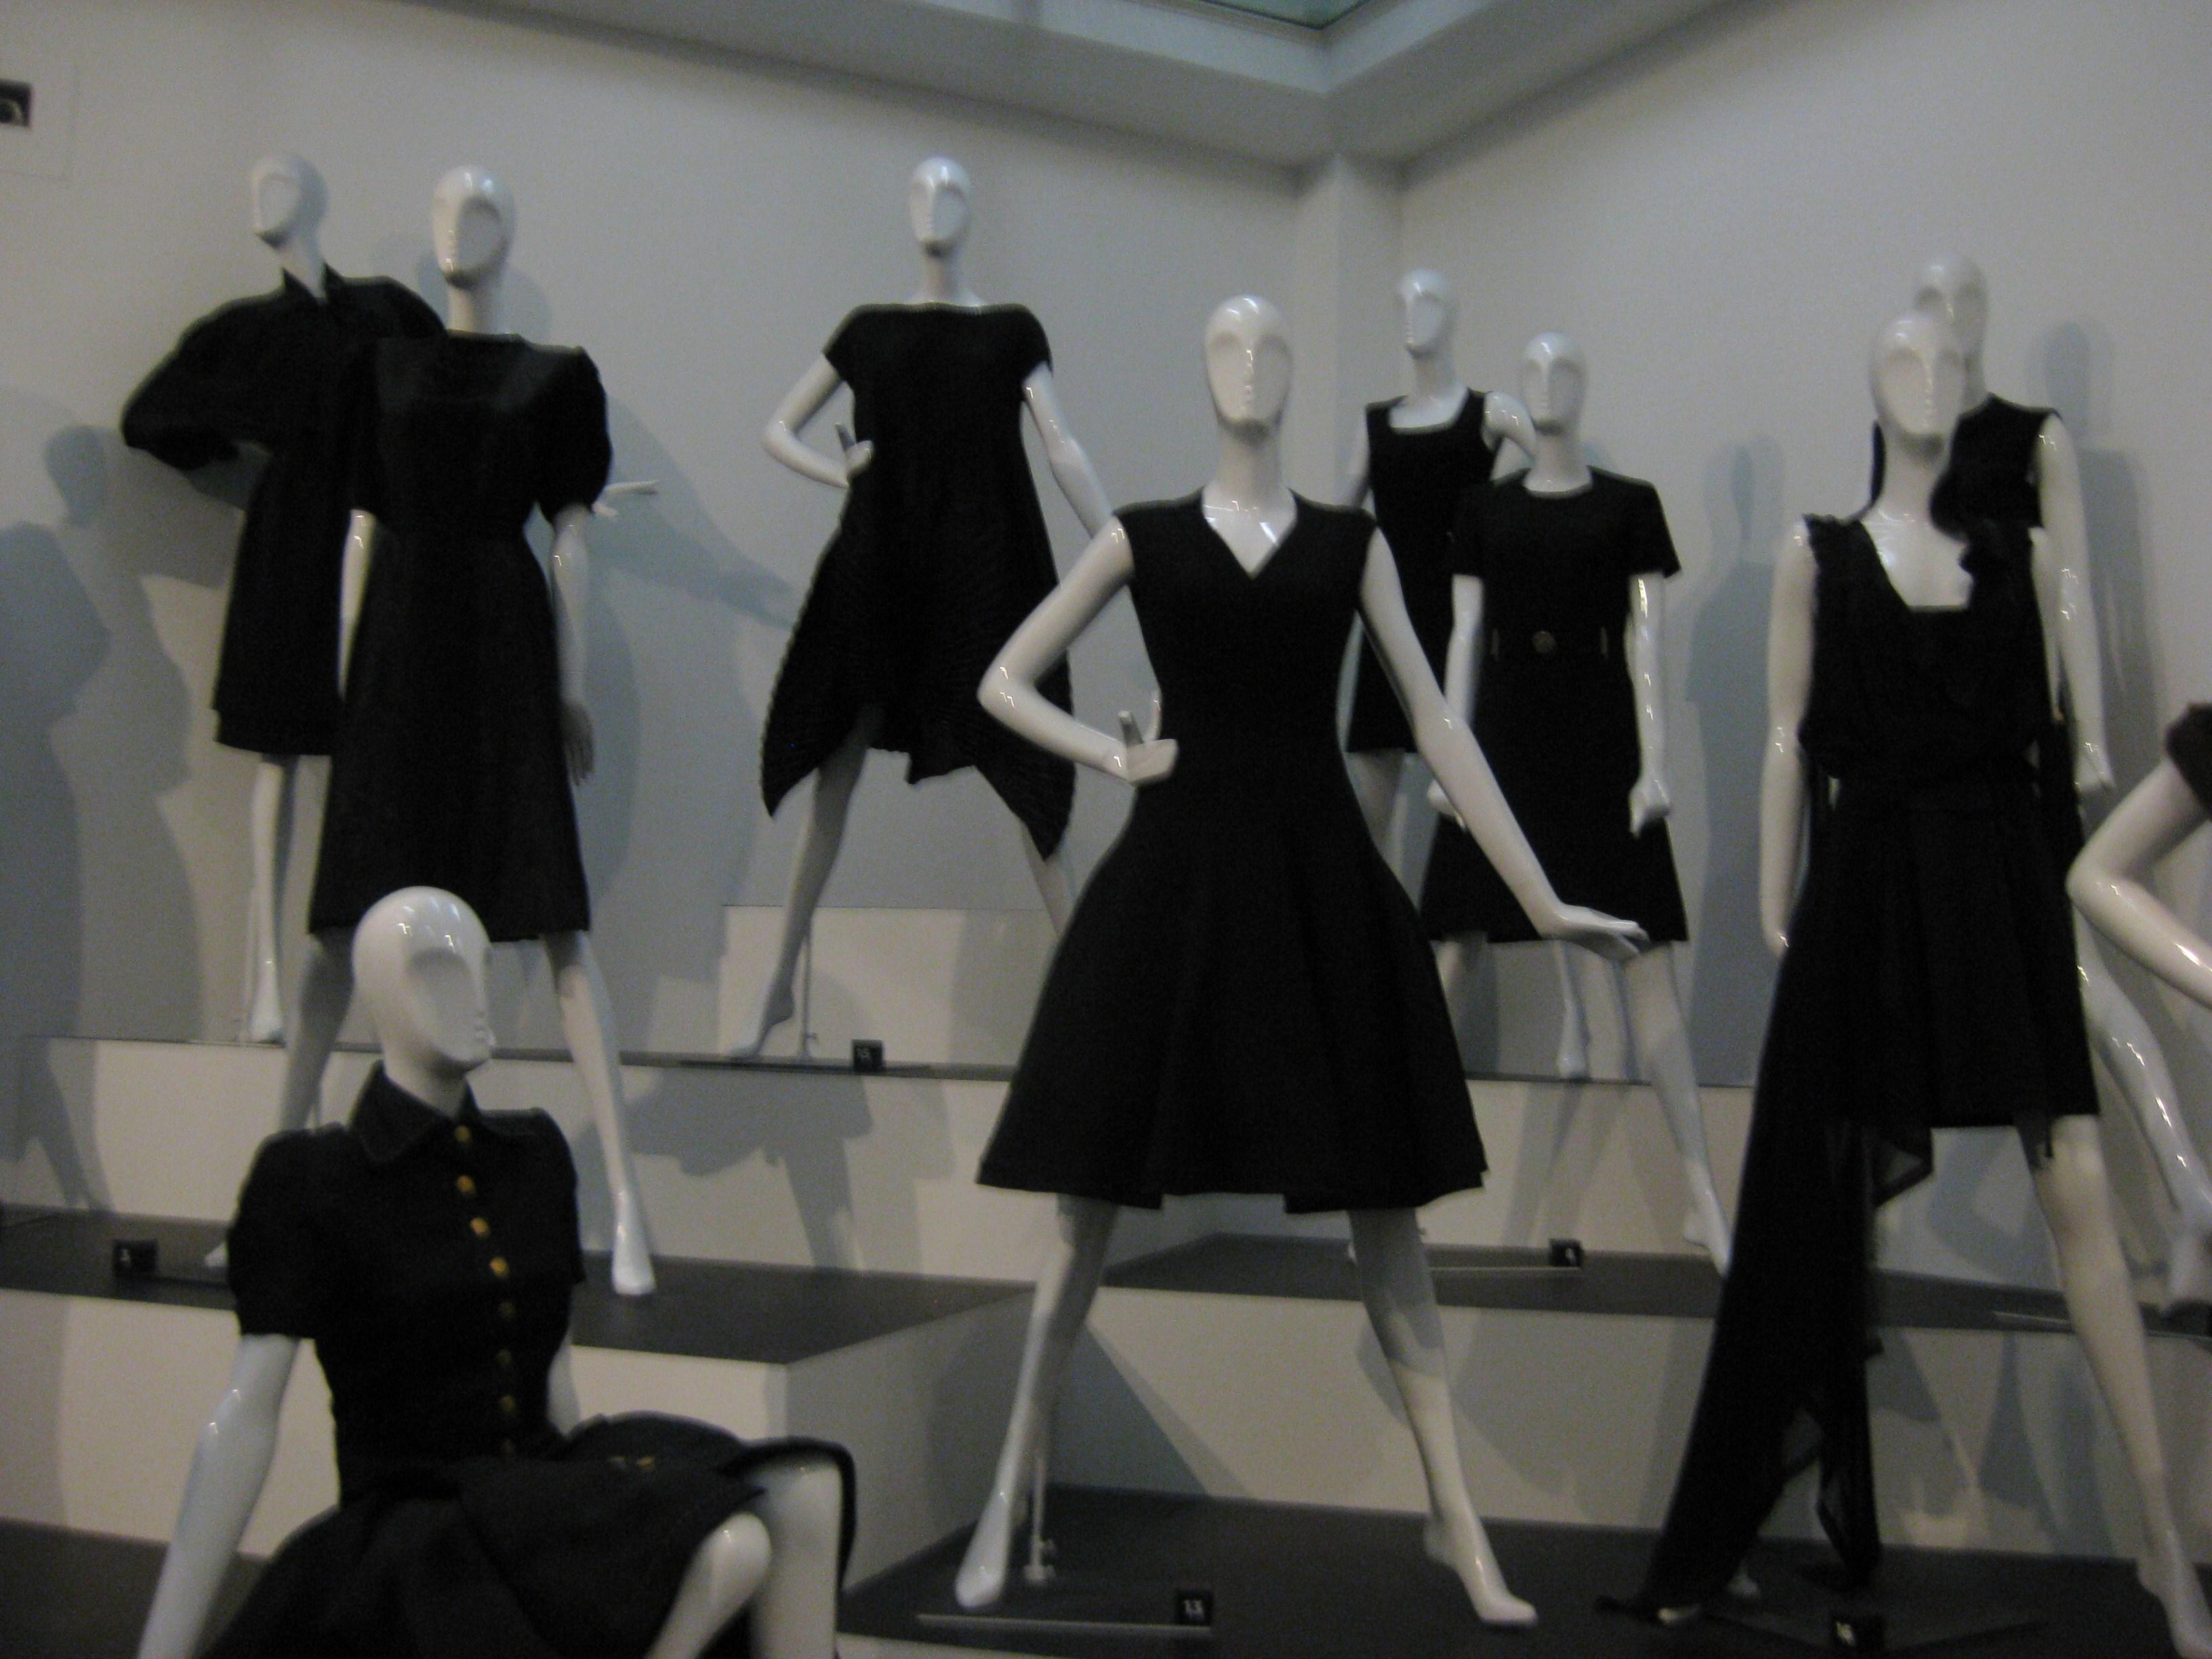 File:Klein zwart jurkje.JPG